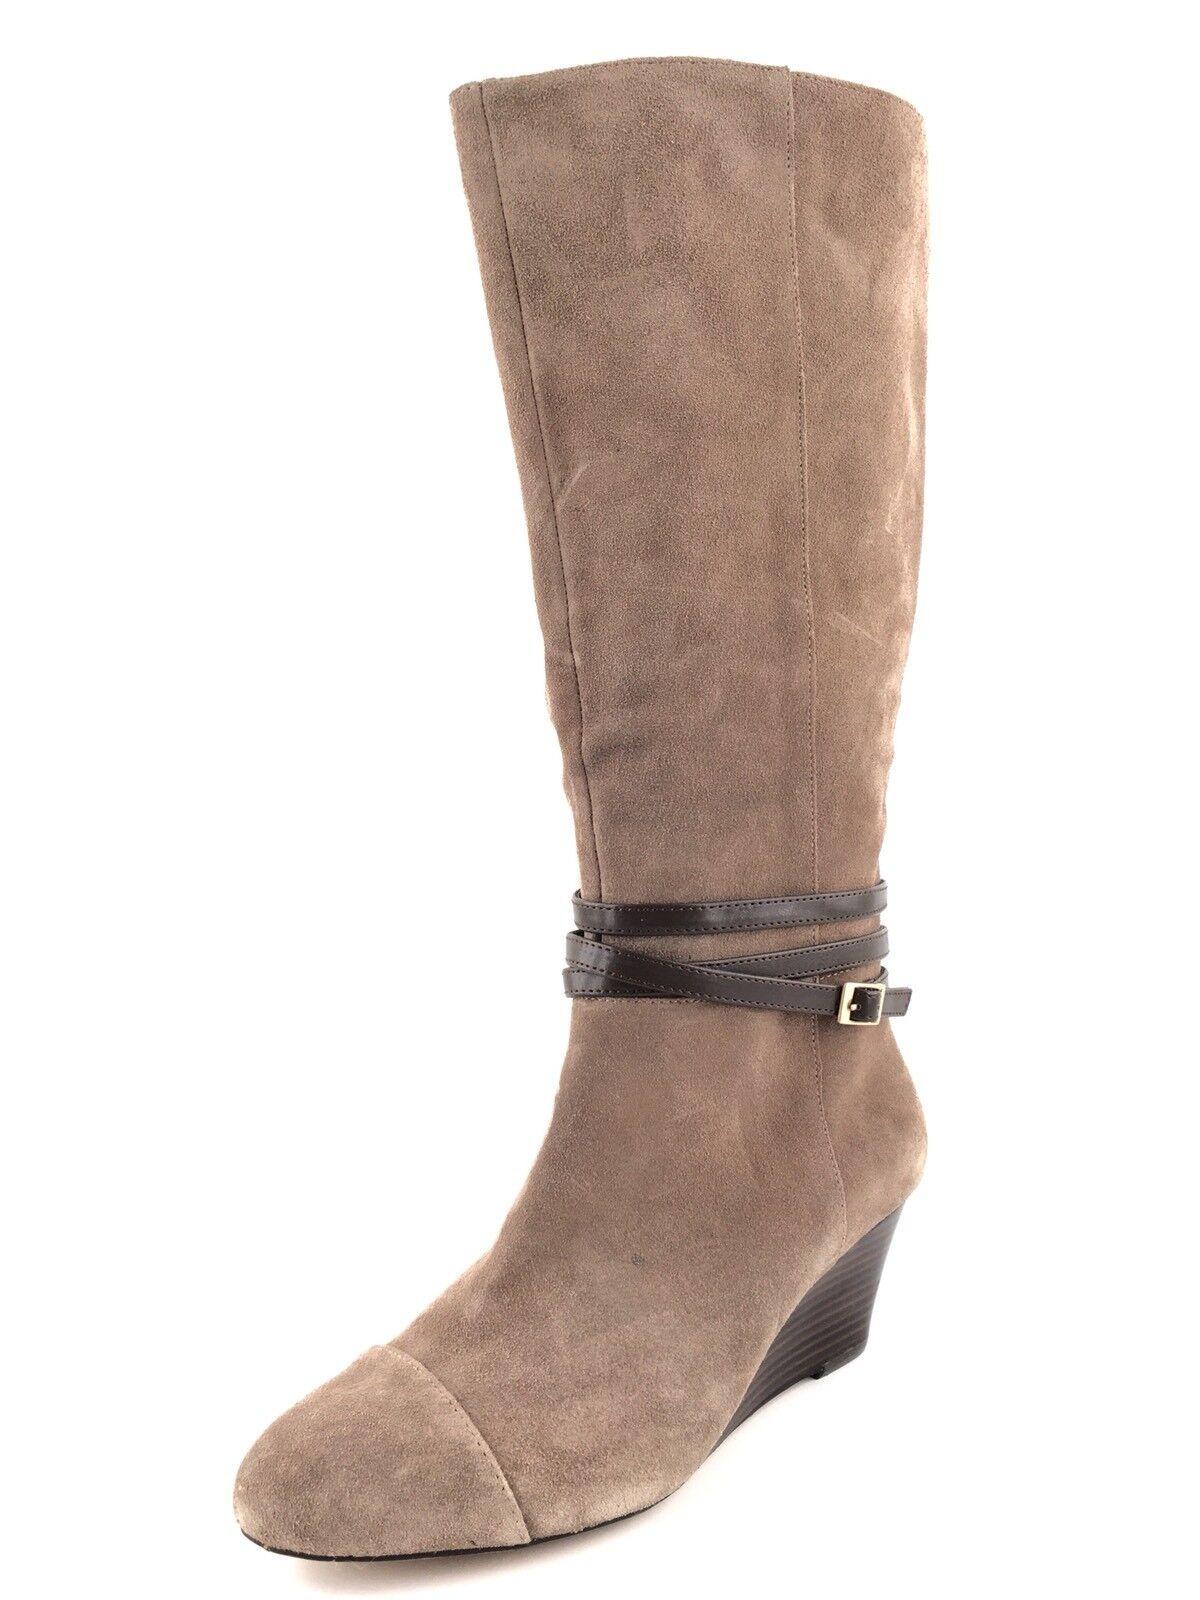 salutare Sole Society Society Society Nila Taupe Suede Wedge Knee High stivali donna Dimensione 9.5 M   marchi di moda